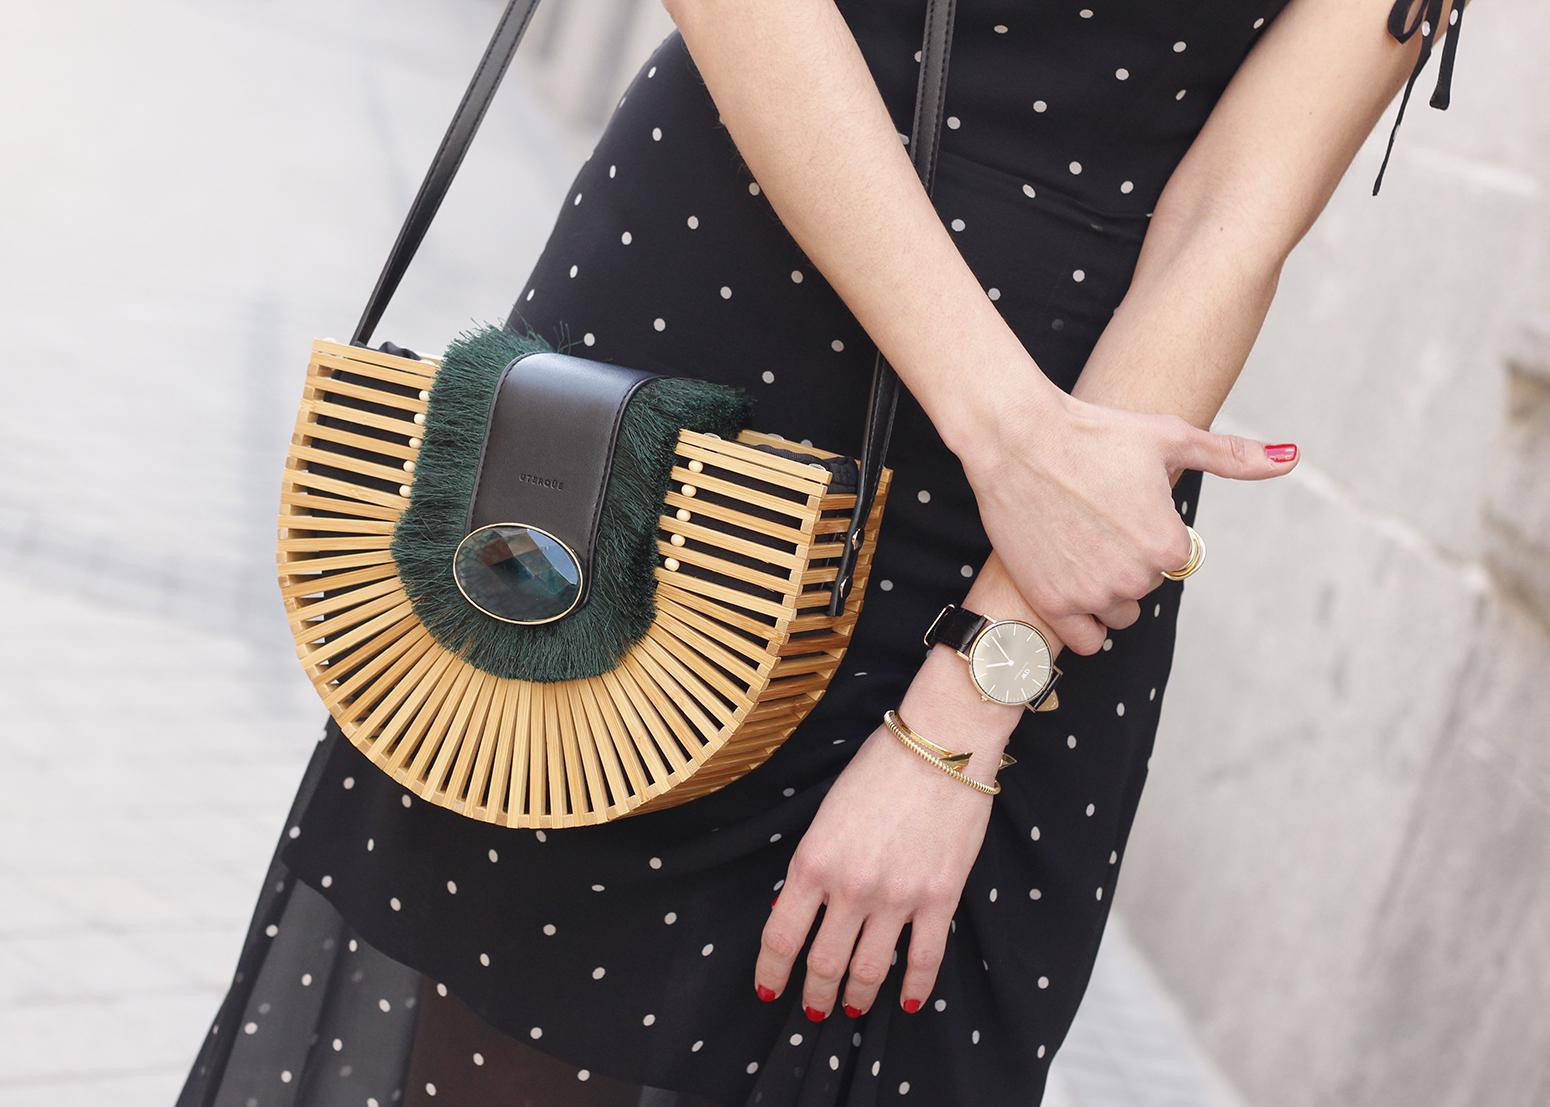 polka dot dress uterqüe jewel heels denim jacket outfit street style bamboo bag11